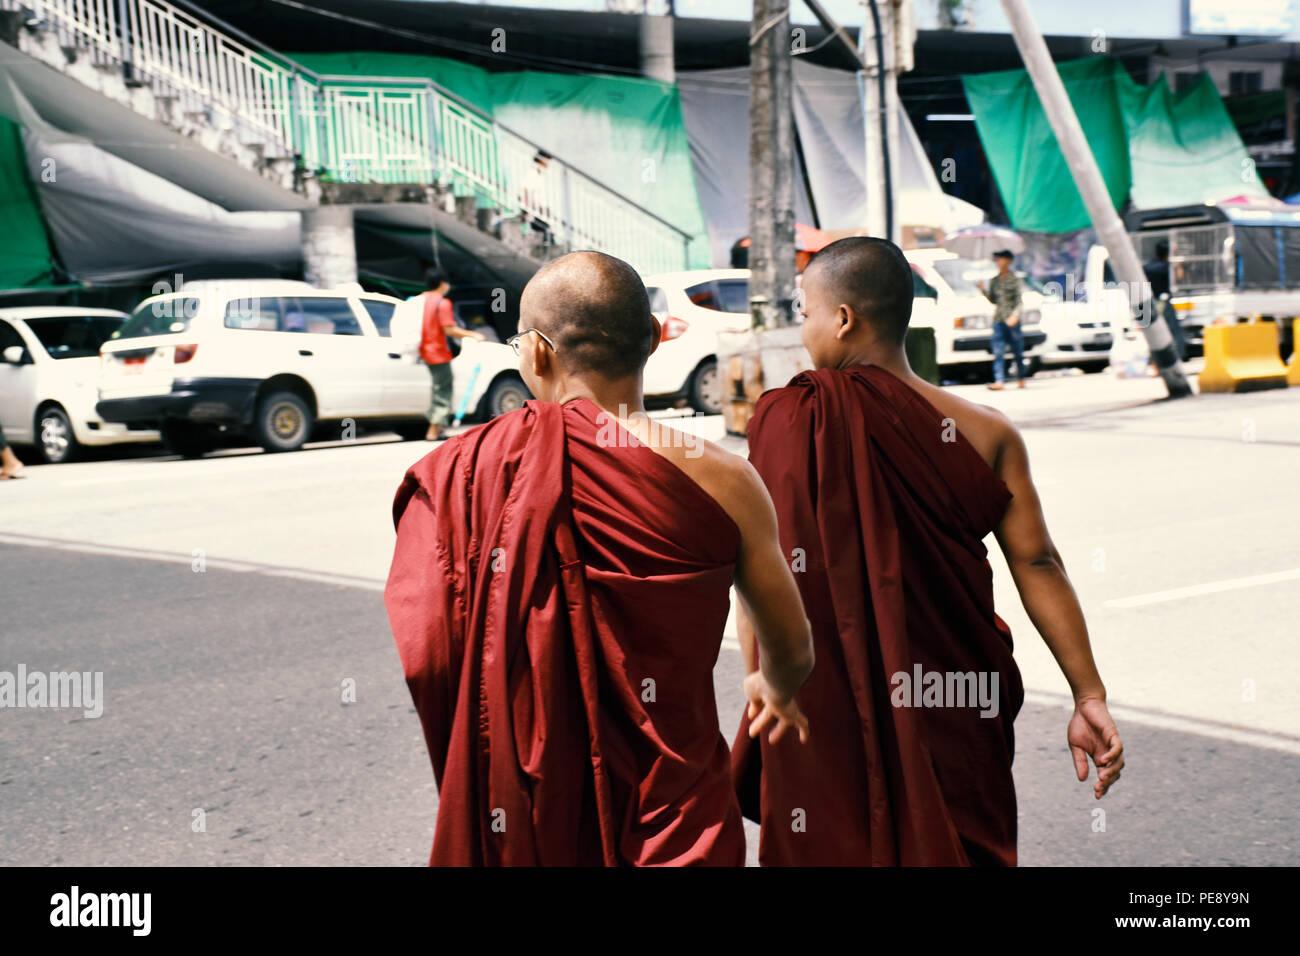 Rwo Buddhist monks crossing the road in Yangon, Myanmar - Stock Image